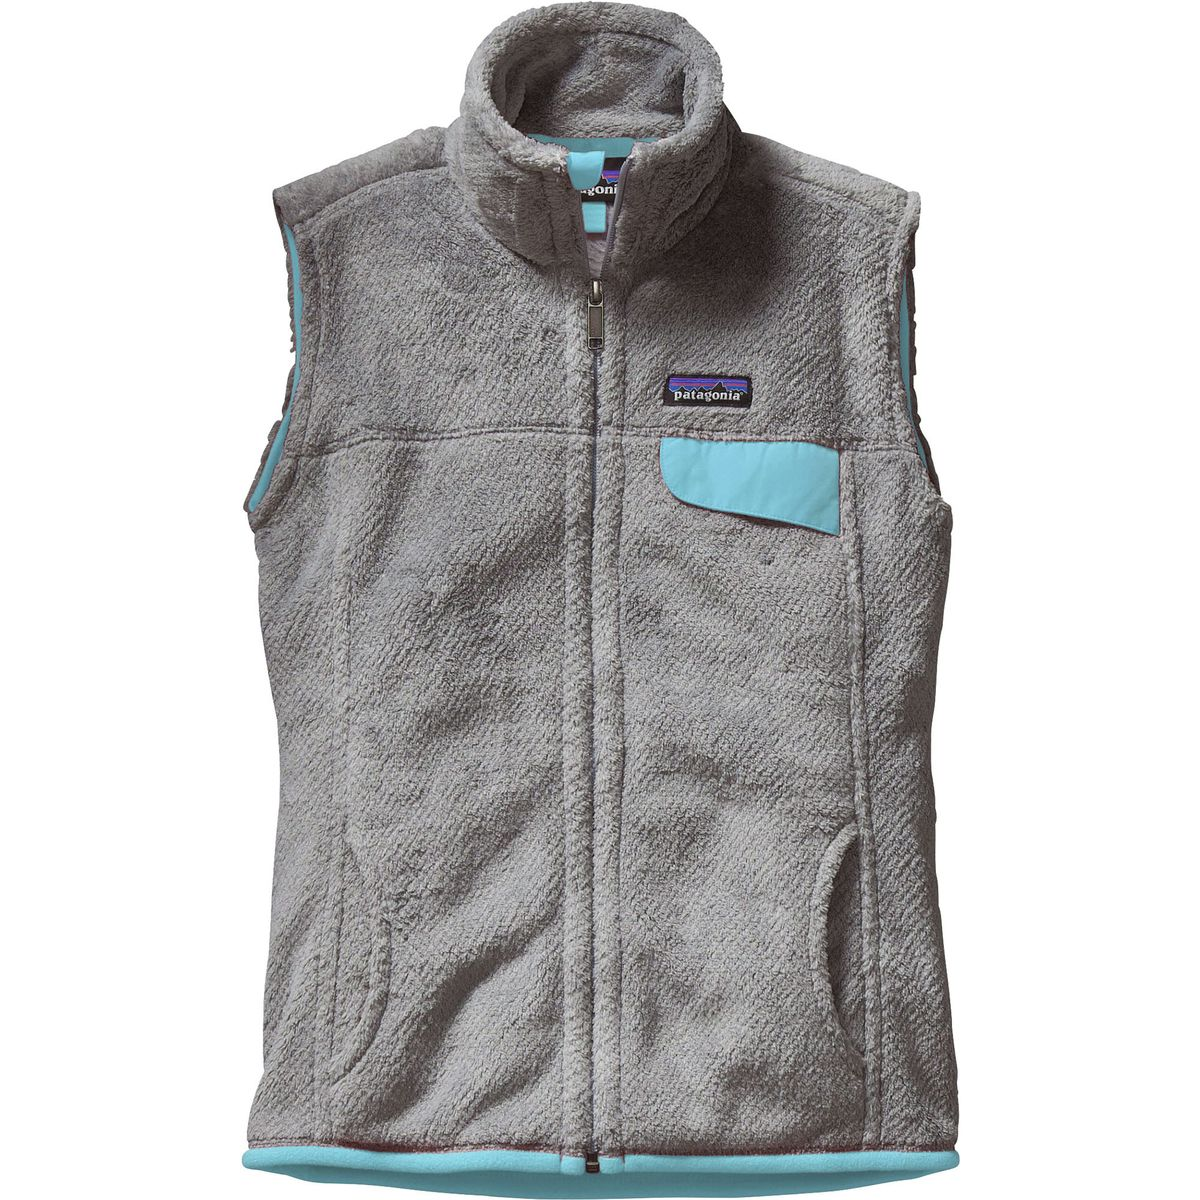 Patagonia Re-Tool Vest - Women